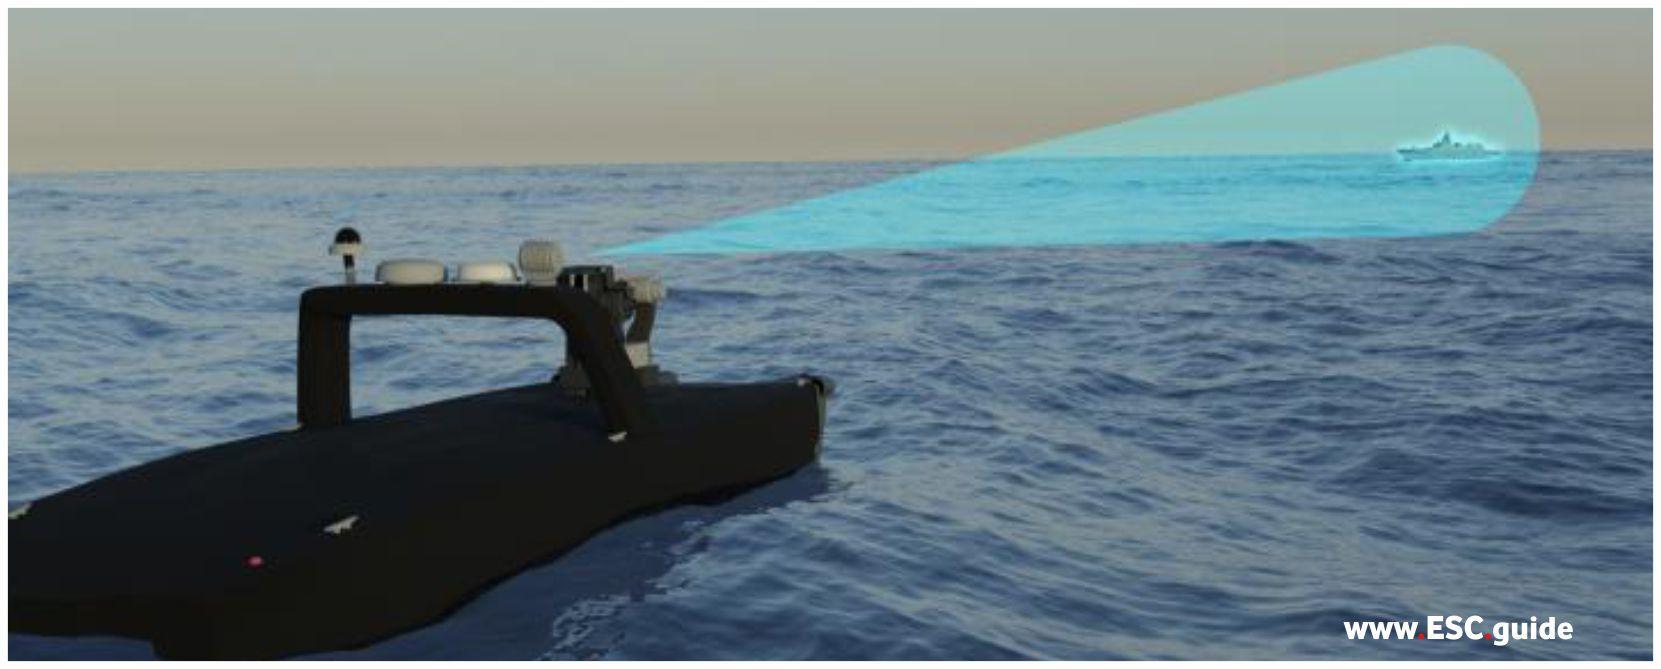 Configuration: MANTAS T38 AIO detects adversarial vessel over the horizon.